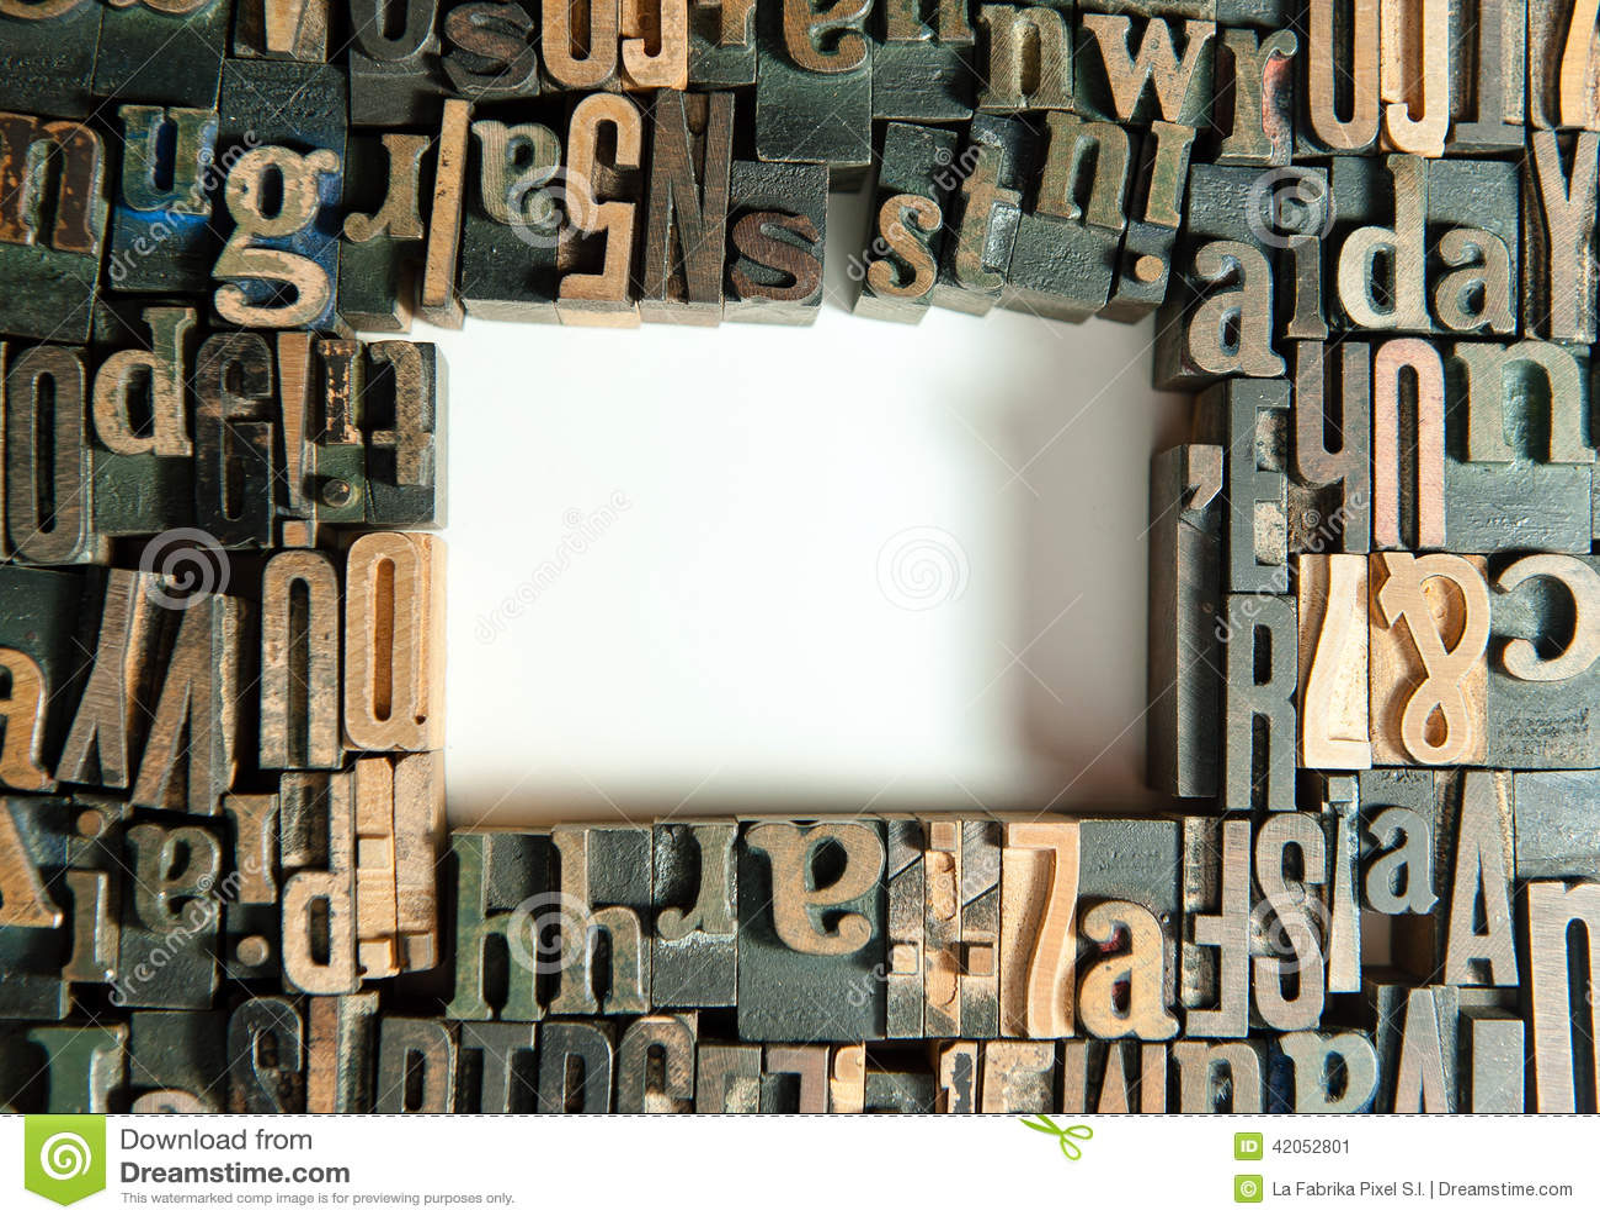 framed prints for kitchens reclaimed wood kitchen shelves 印刷品框架特写镜头库存图片 图片包括有新闻 墨水 平板印刷 行业 印刷品框架特写镜头